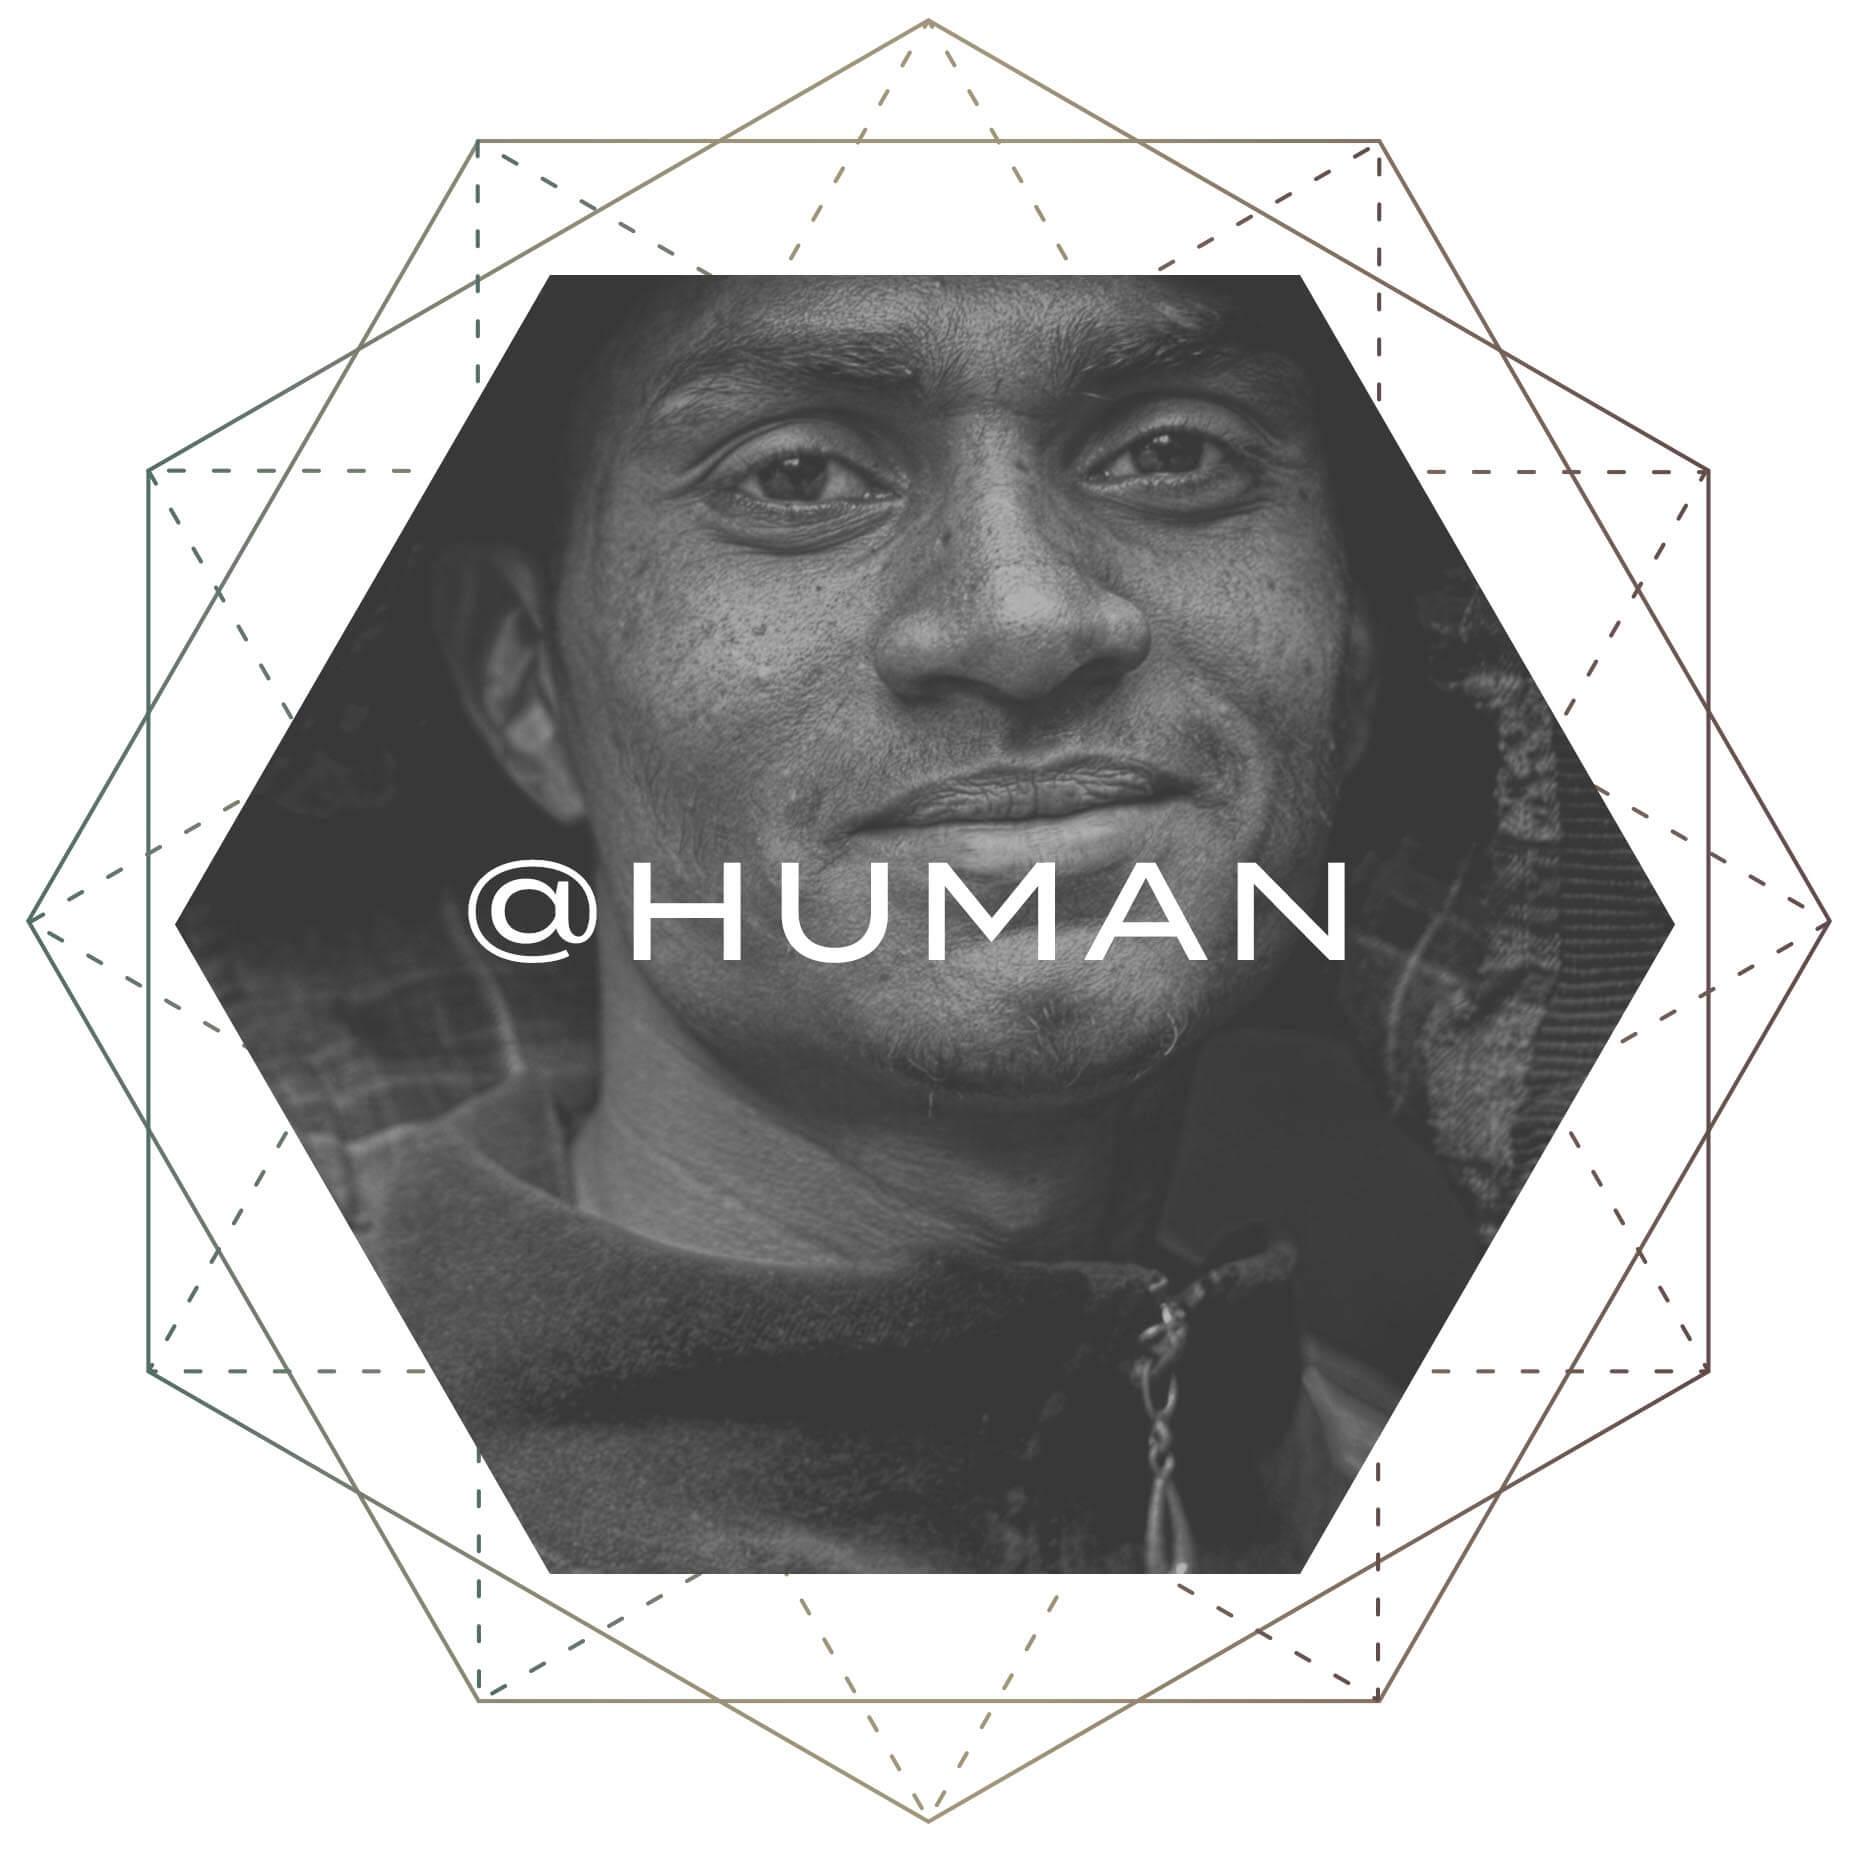 Humans-6